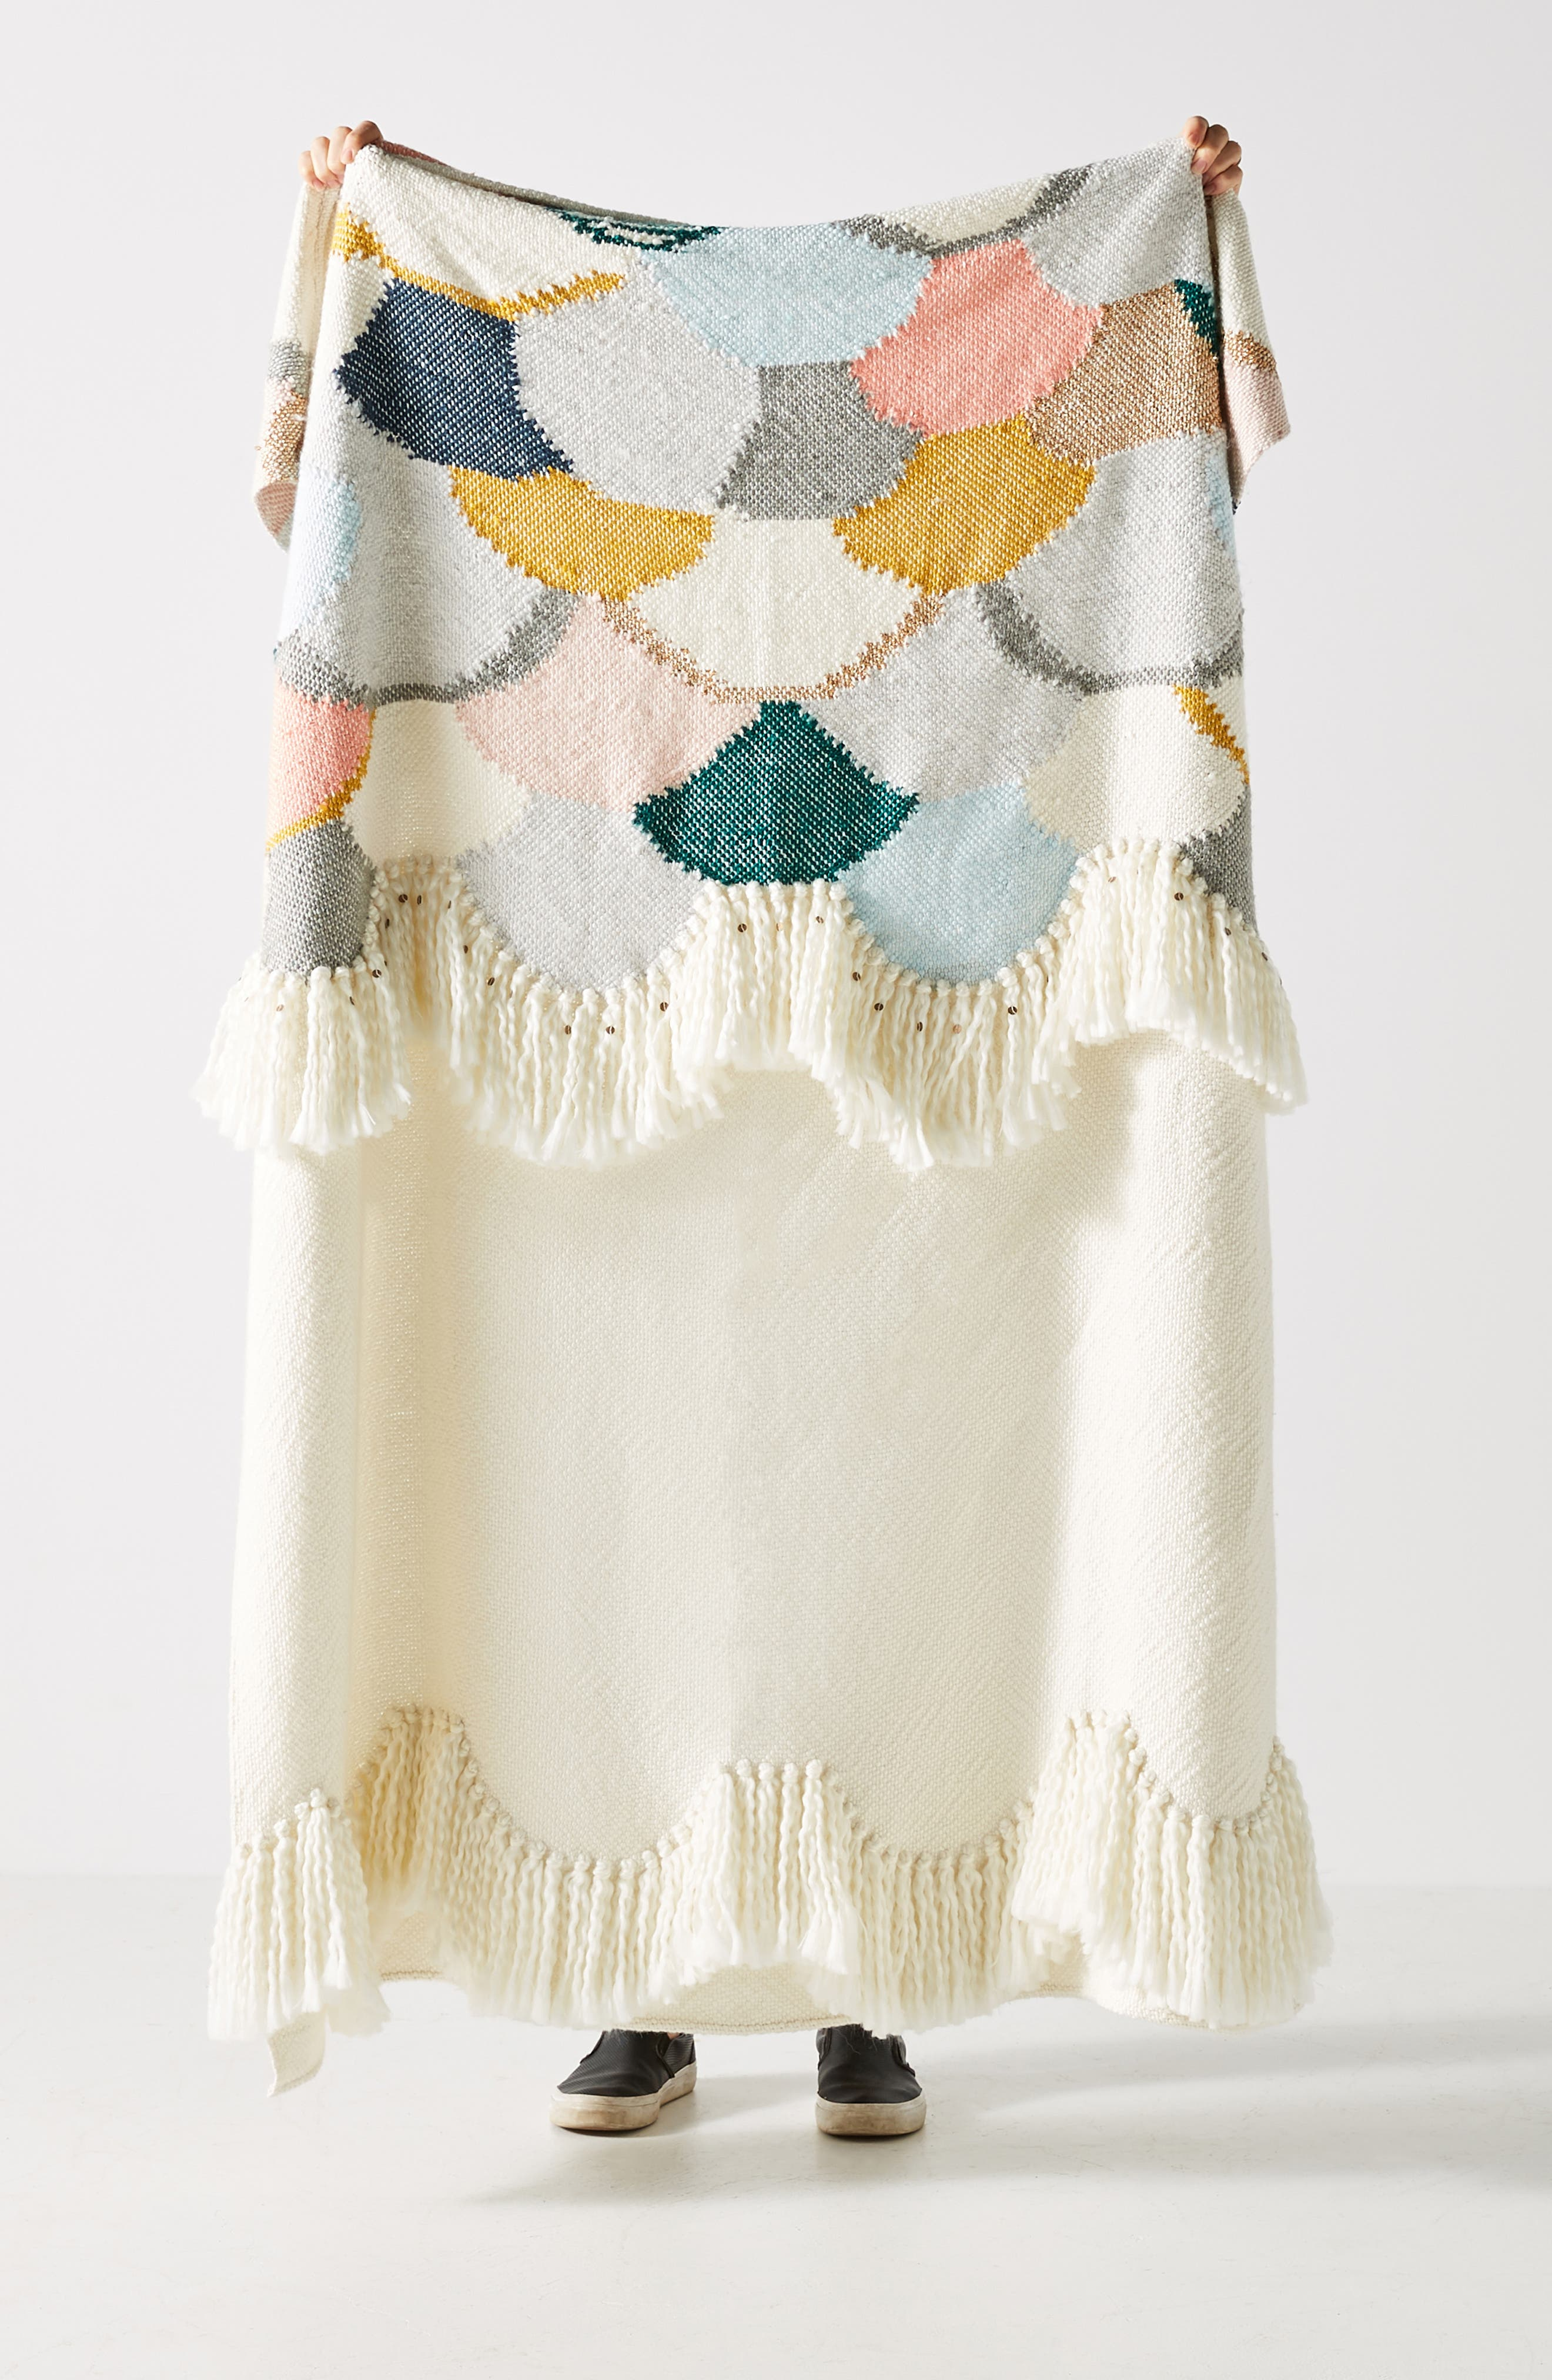 anthropologie lindsay campbell throw blanket